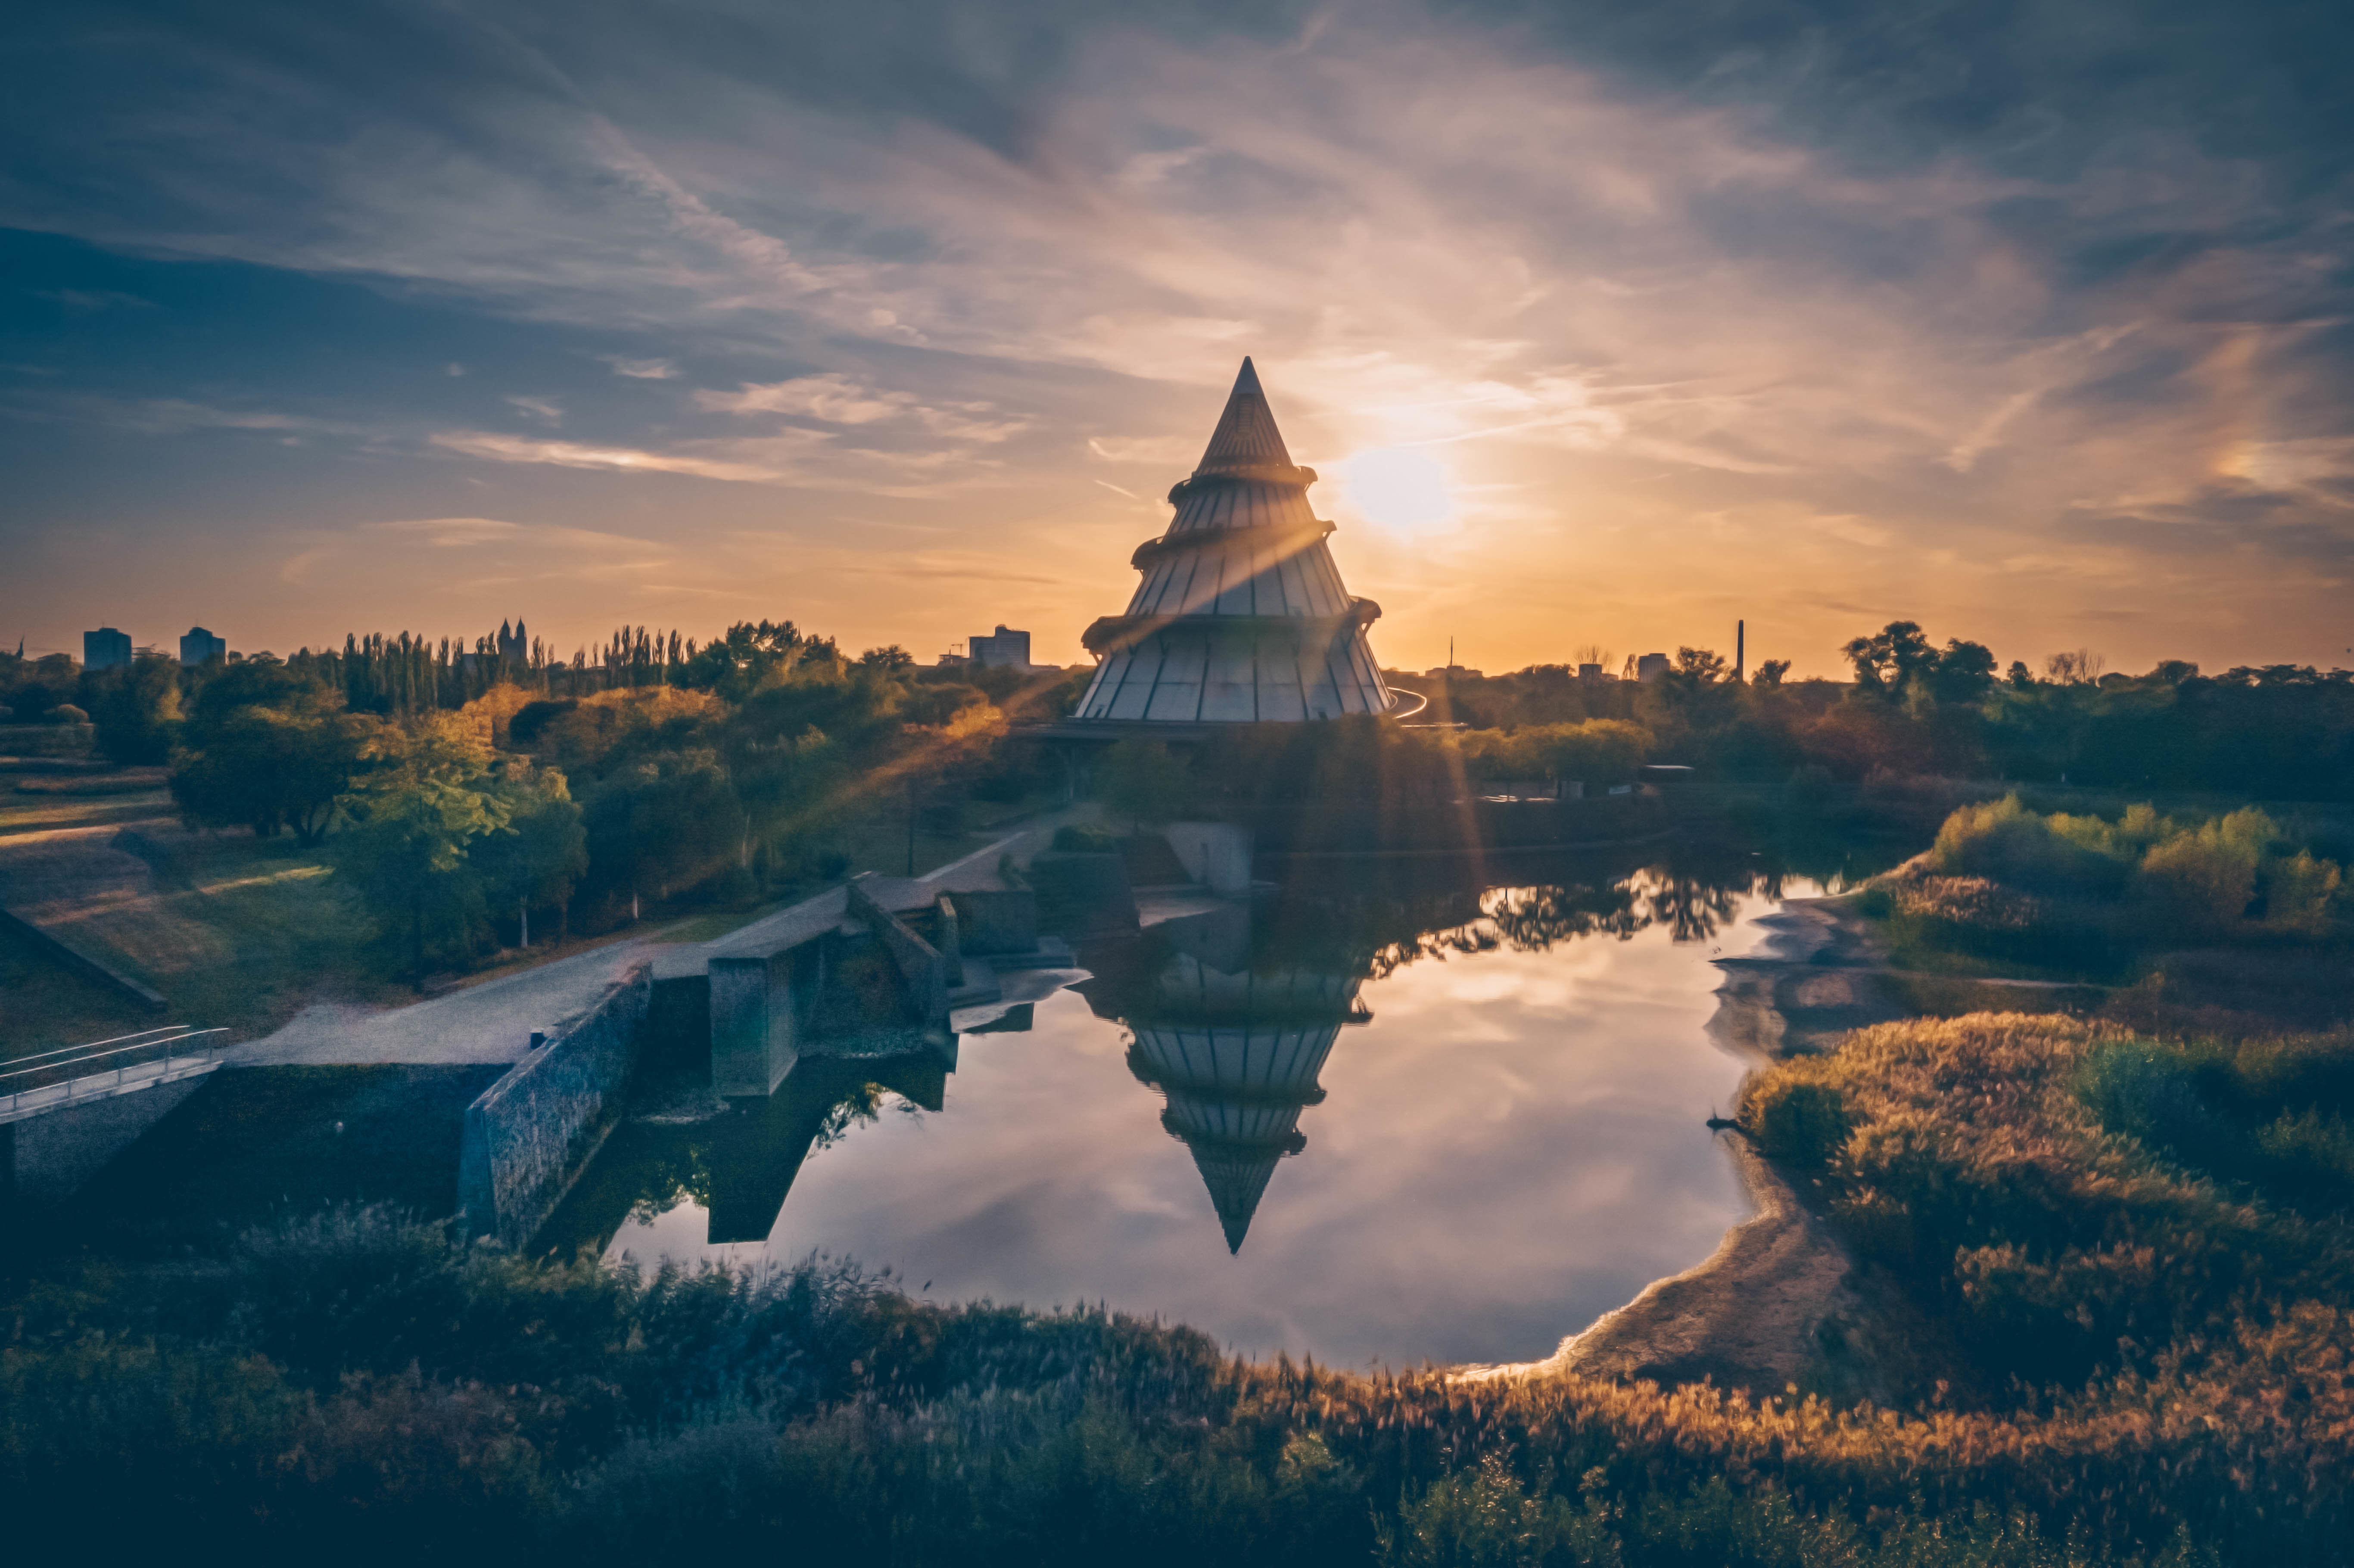 Am Jahrtausendturm bei Sonnenuntergang